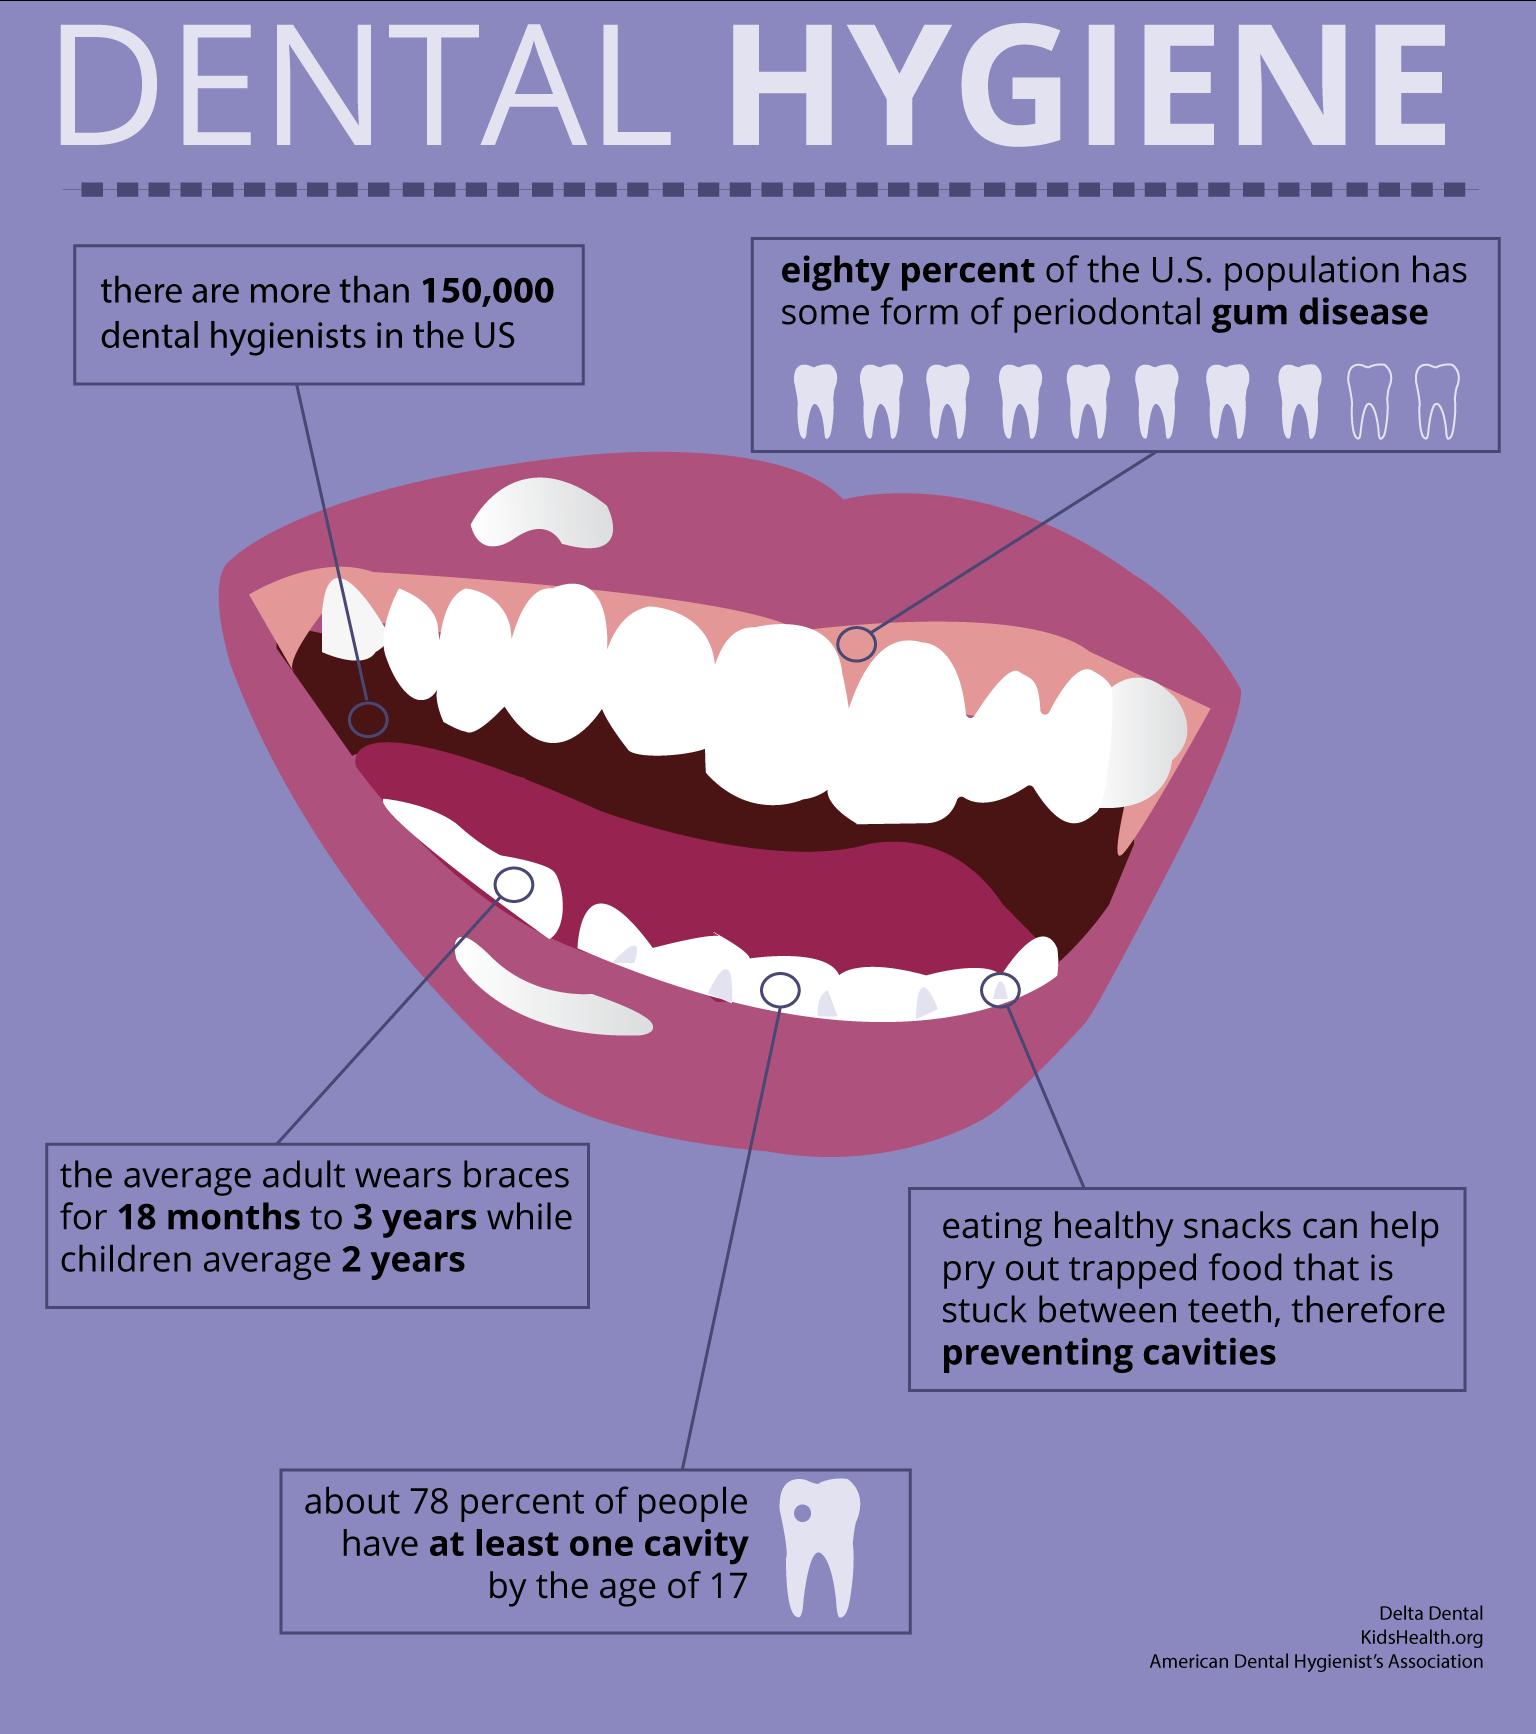 dental-hygiene-infographic